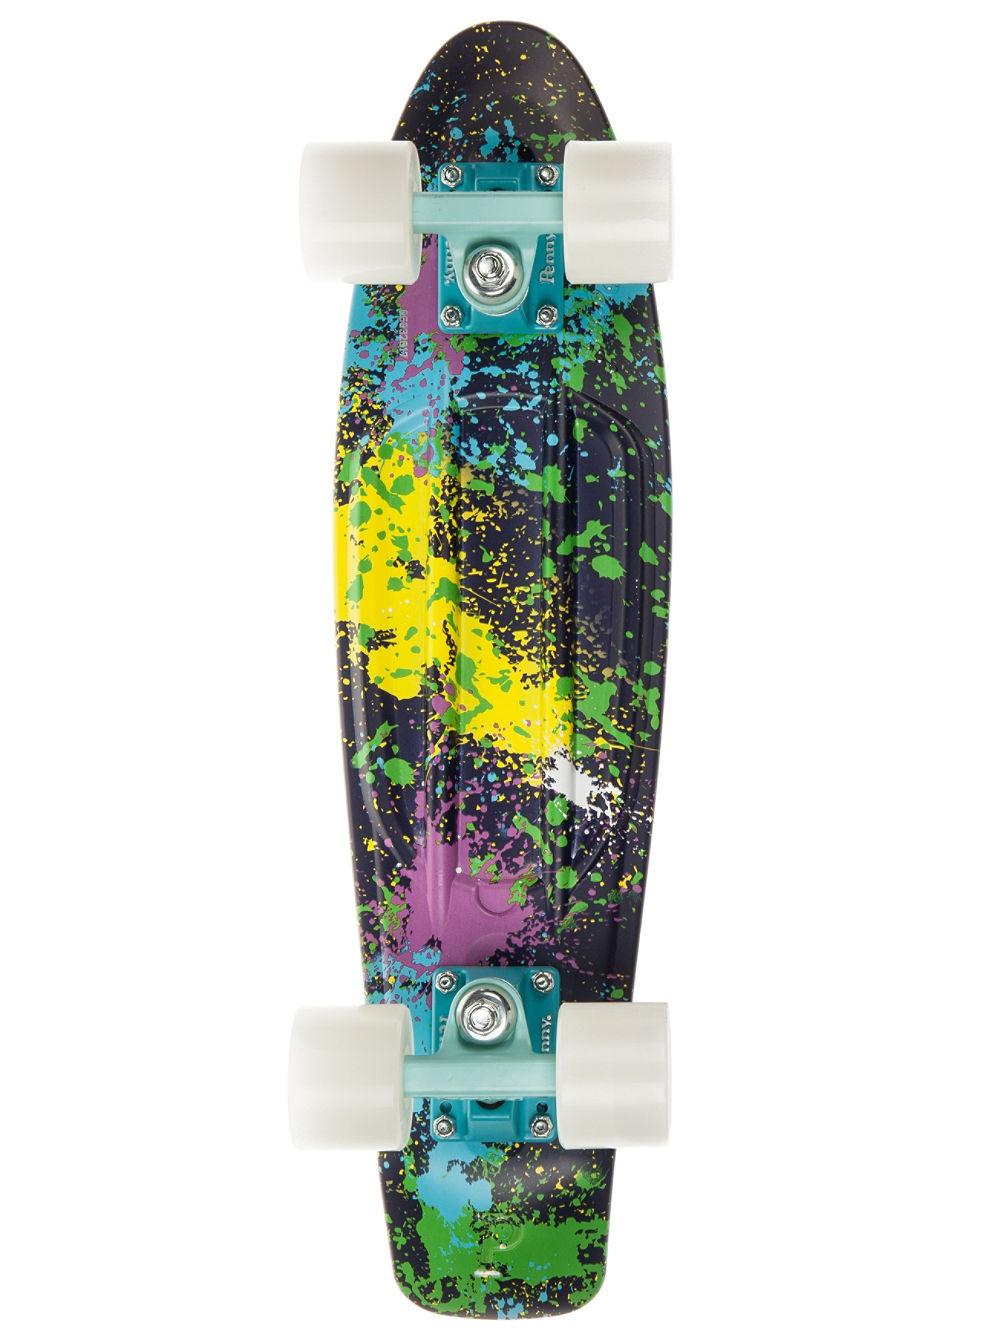 penny skateboards x rastaclat 22 complete online kaufen bei blue. Black Bedroom Furniture Sets. Home Design Ideas